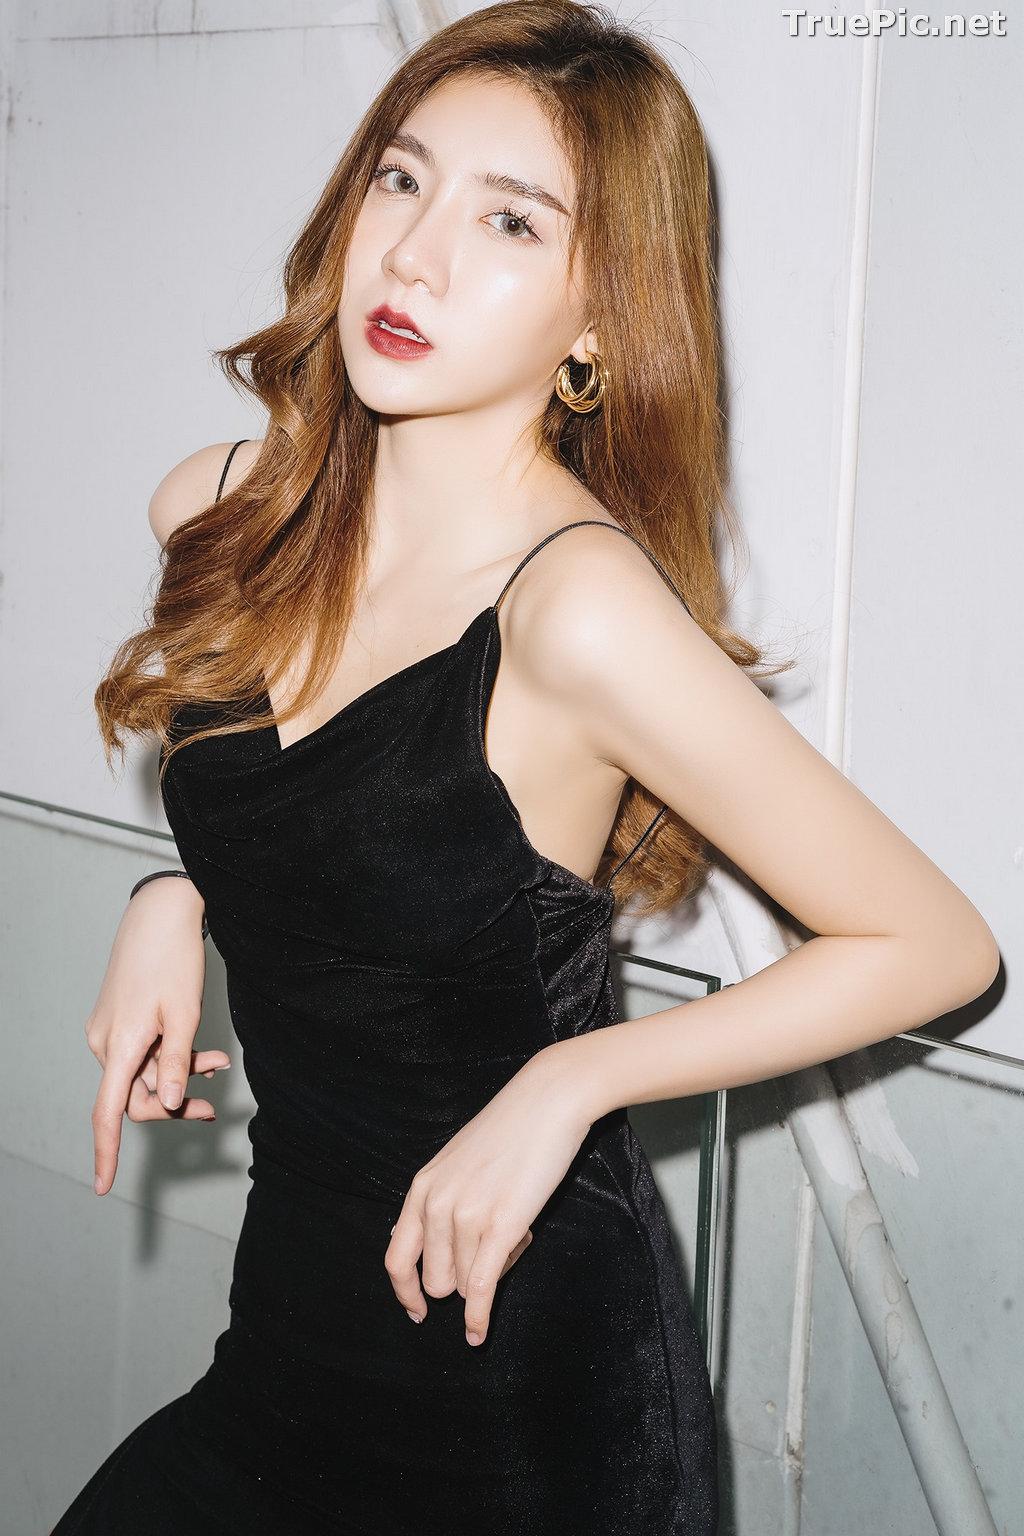 Image Thailand Model - Sasi Ngiunwan - Black For SiamNight - TruePic.net - Picture-32